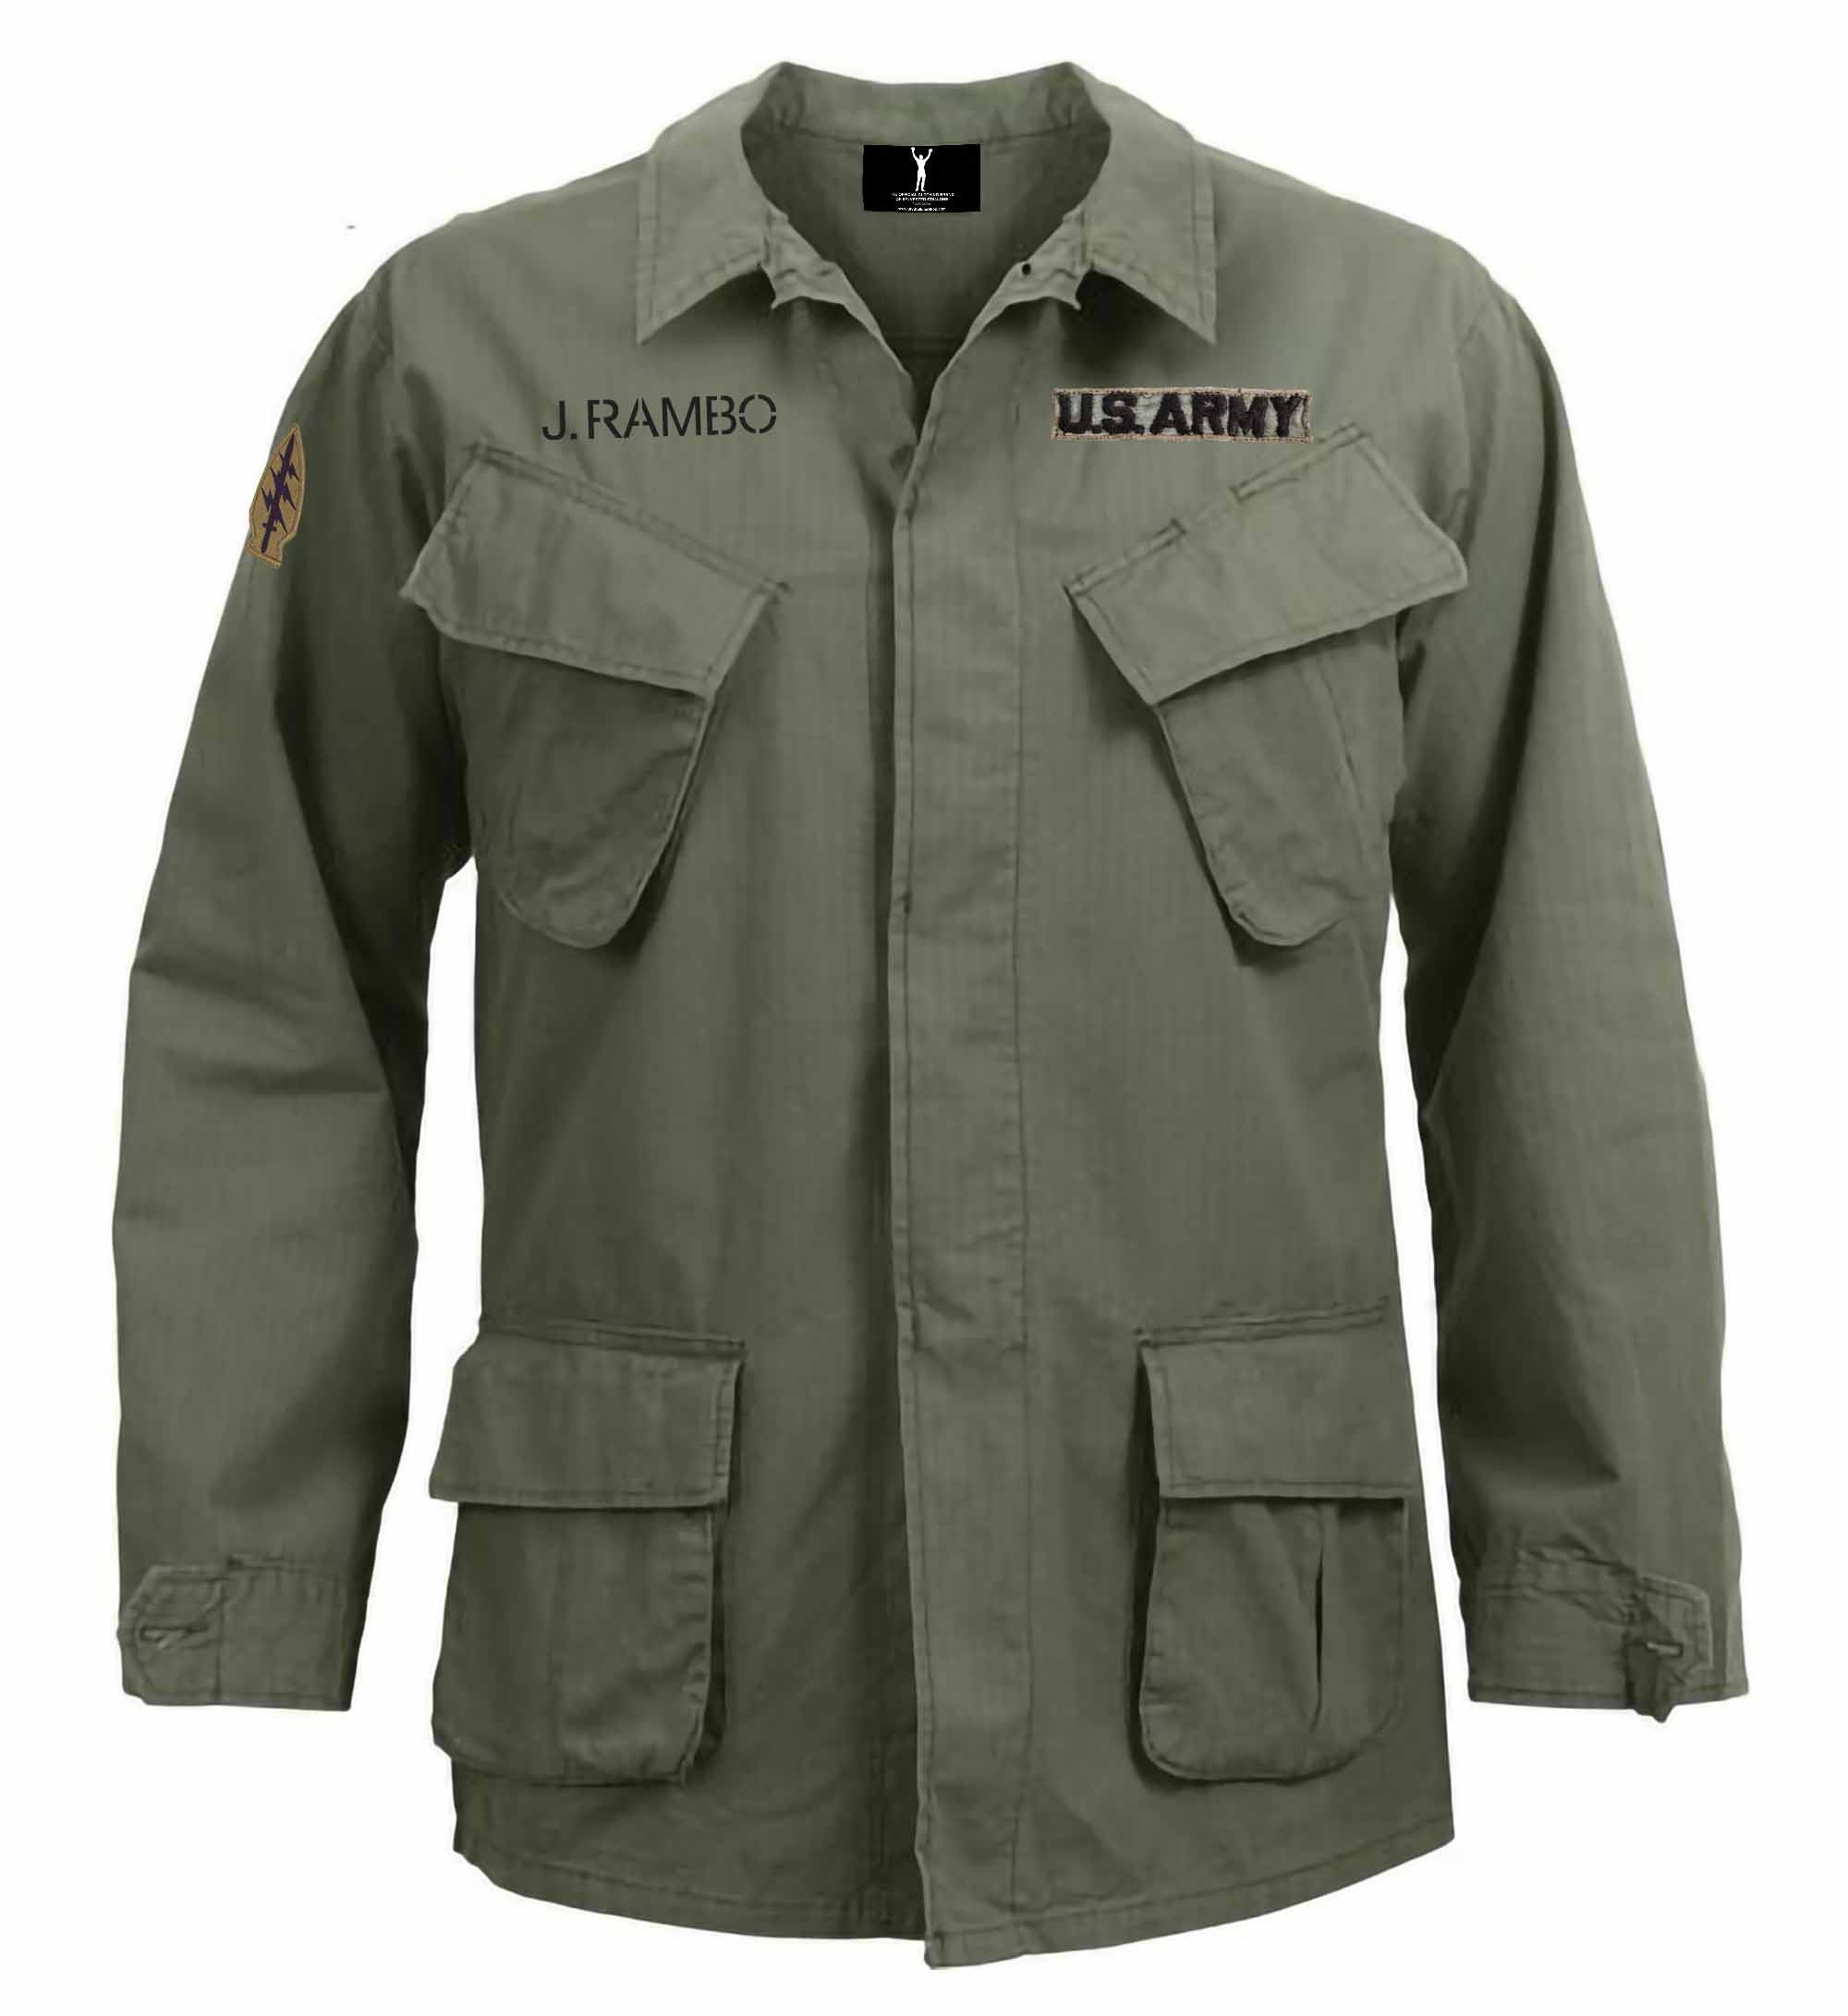 John Rambo Vintage Vietnam Fatigue Shirt